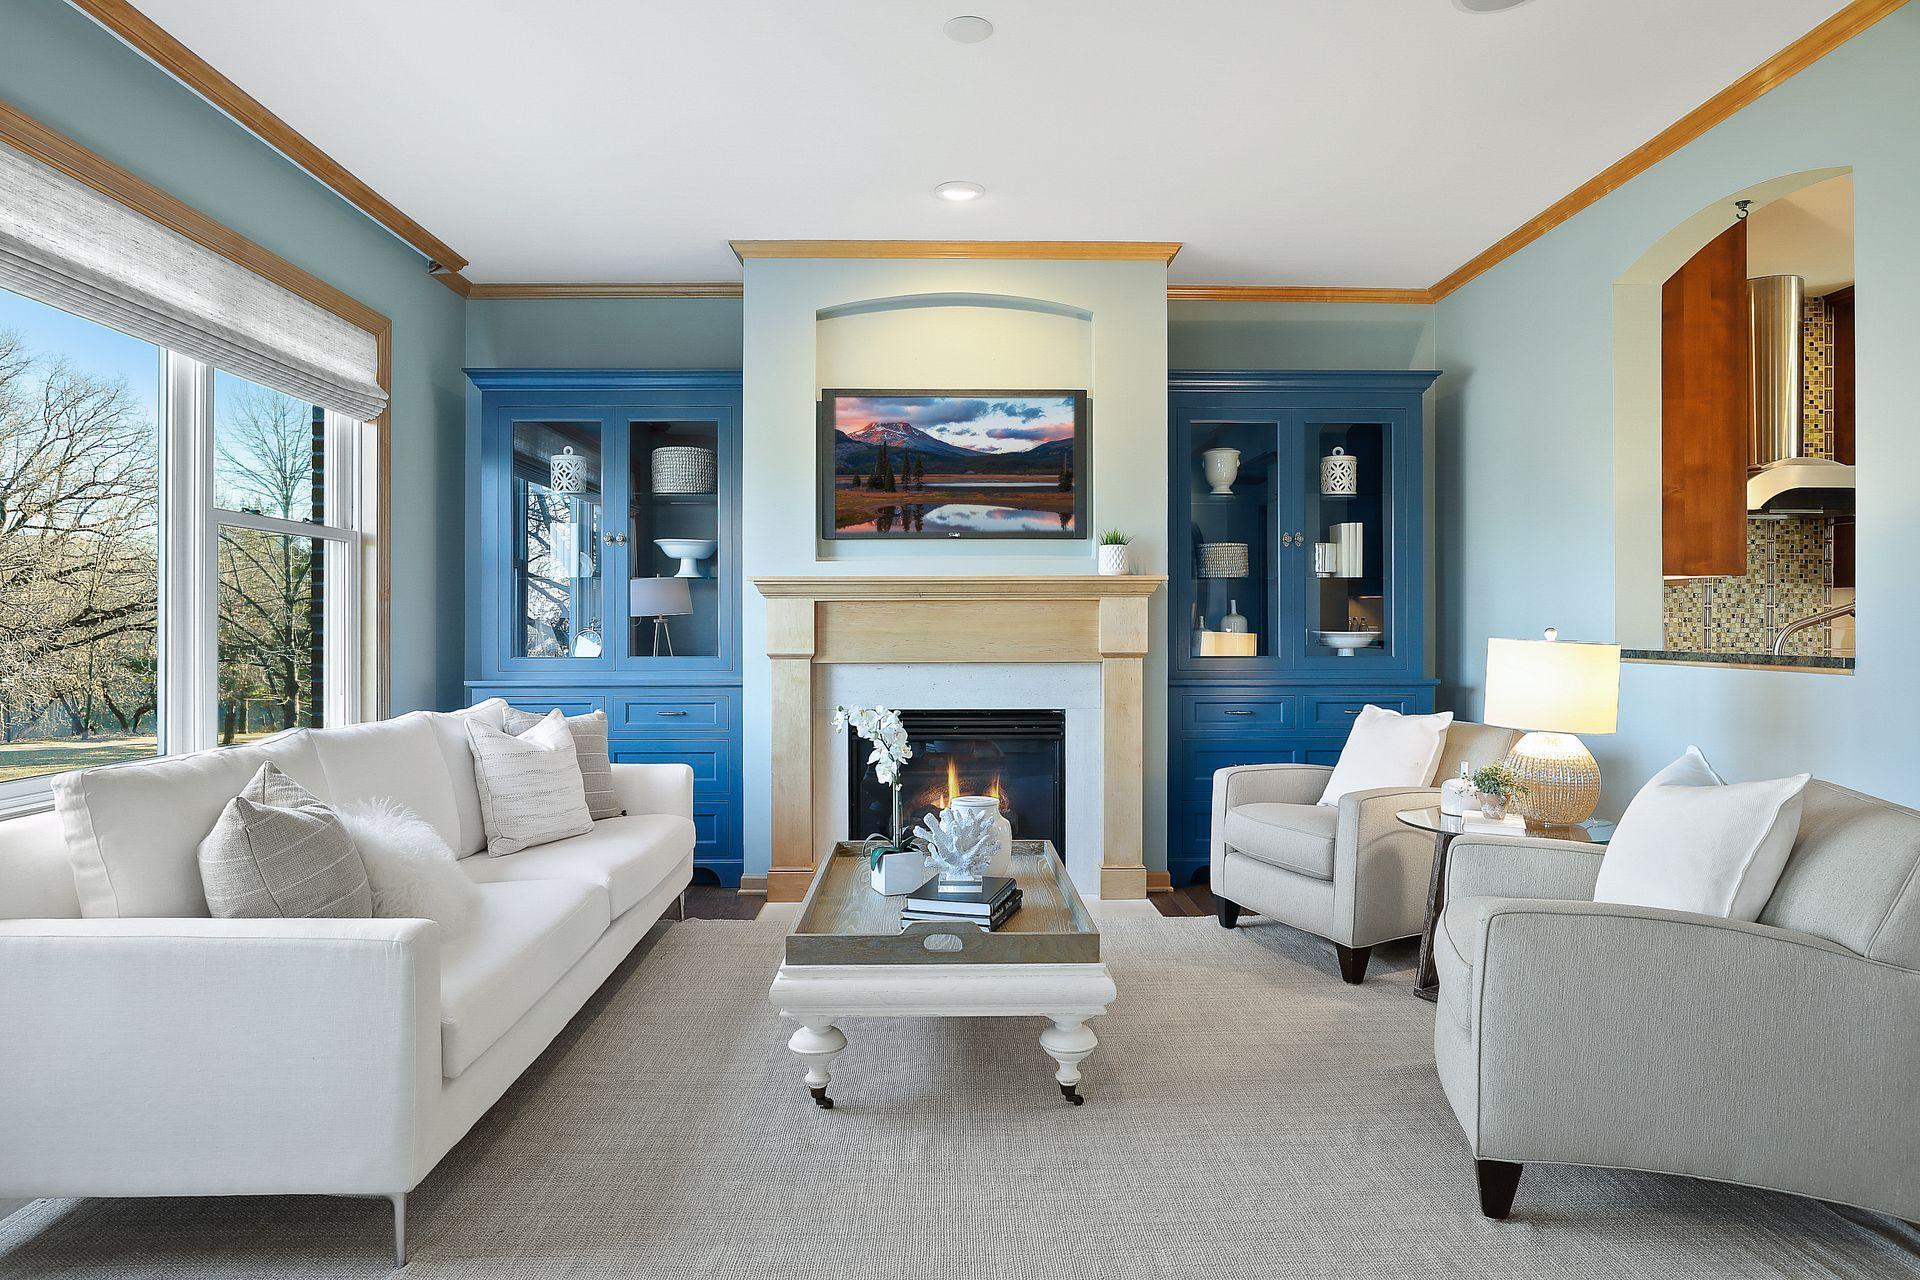 325 W River Parkway #105 Property Photo - Minneapolis, MN real estate listing